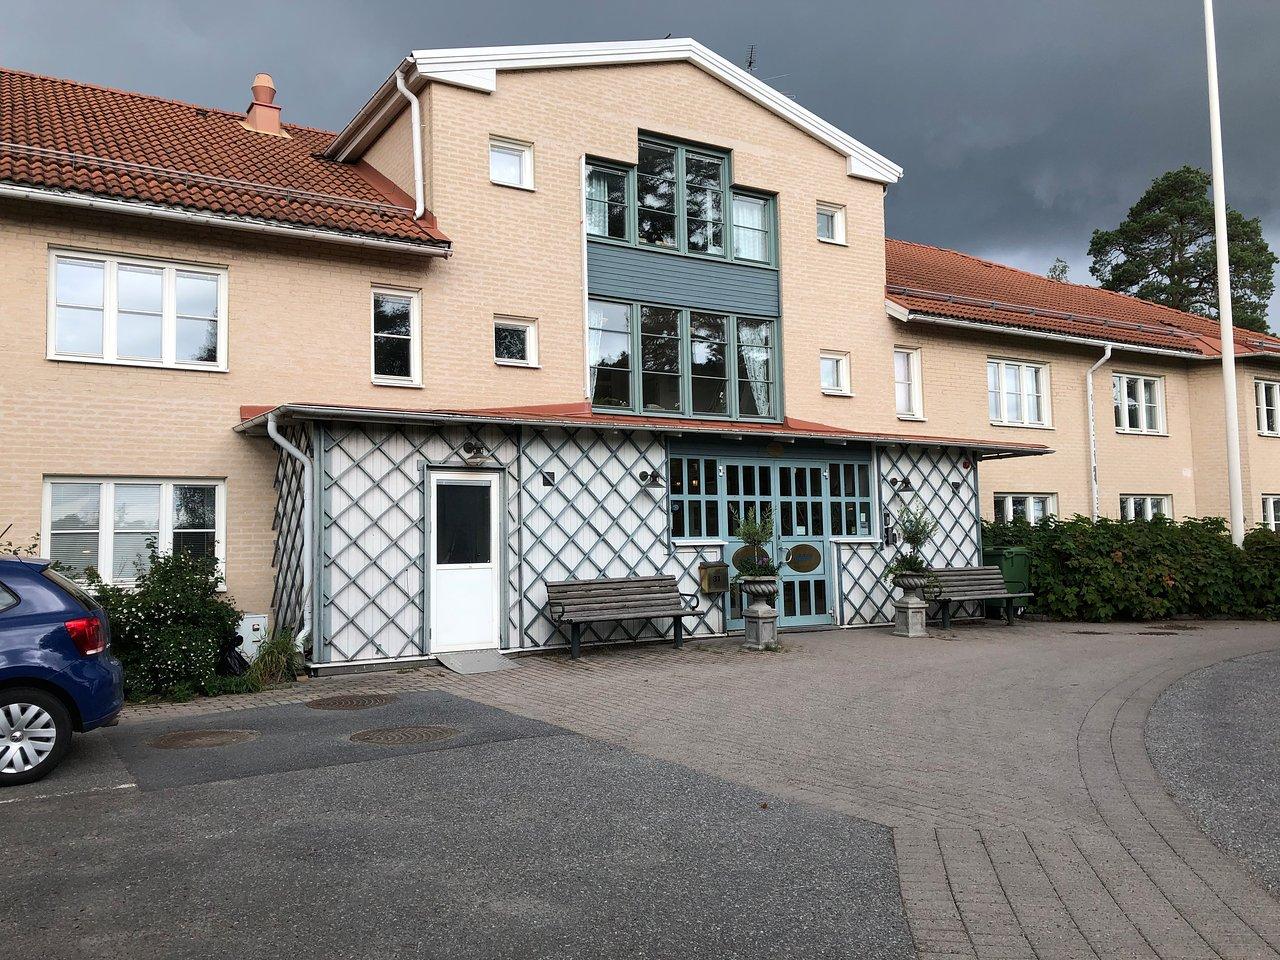 Sexklubb Gteborg Spa I Halland Porriga Tjejer Thaimassage